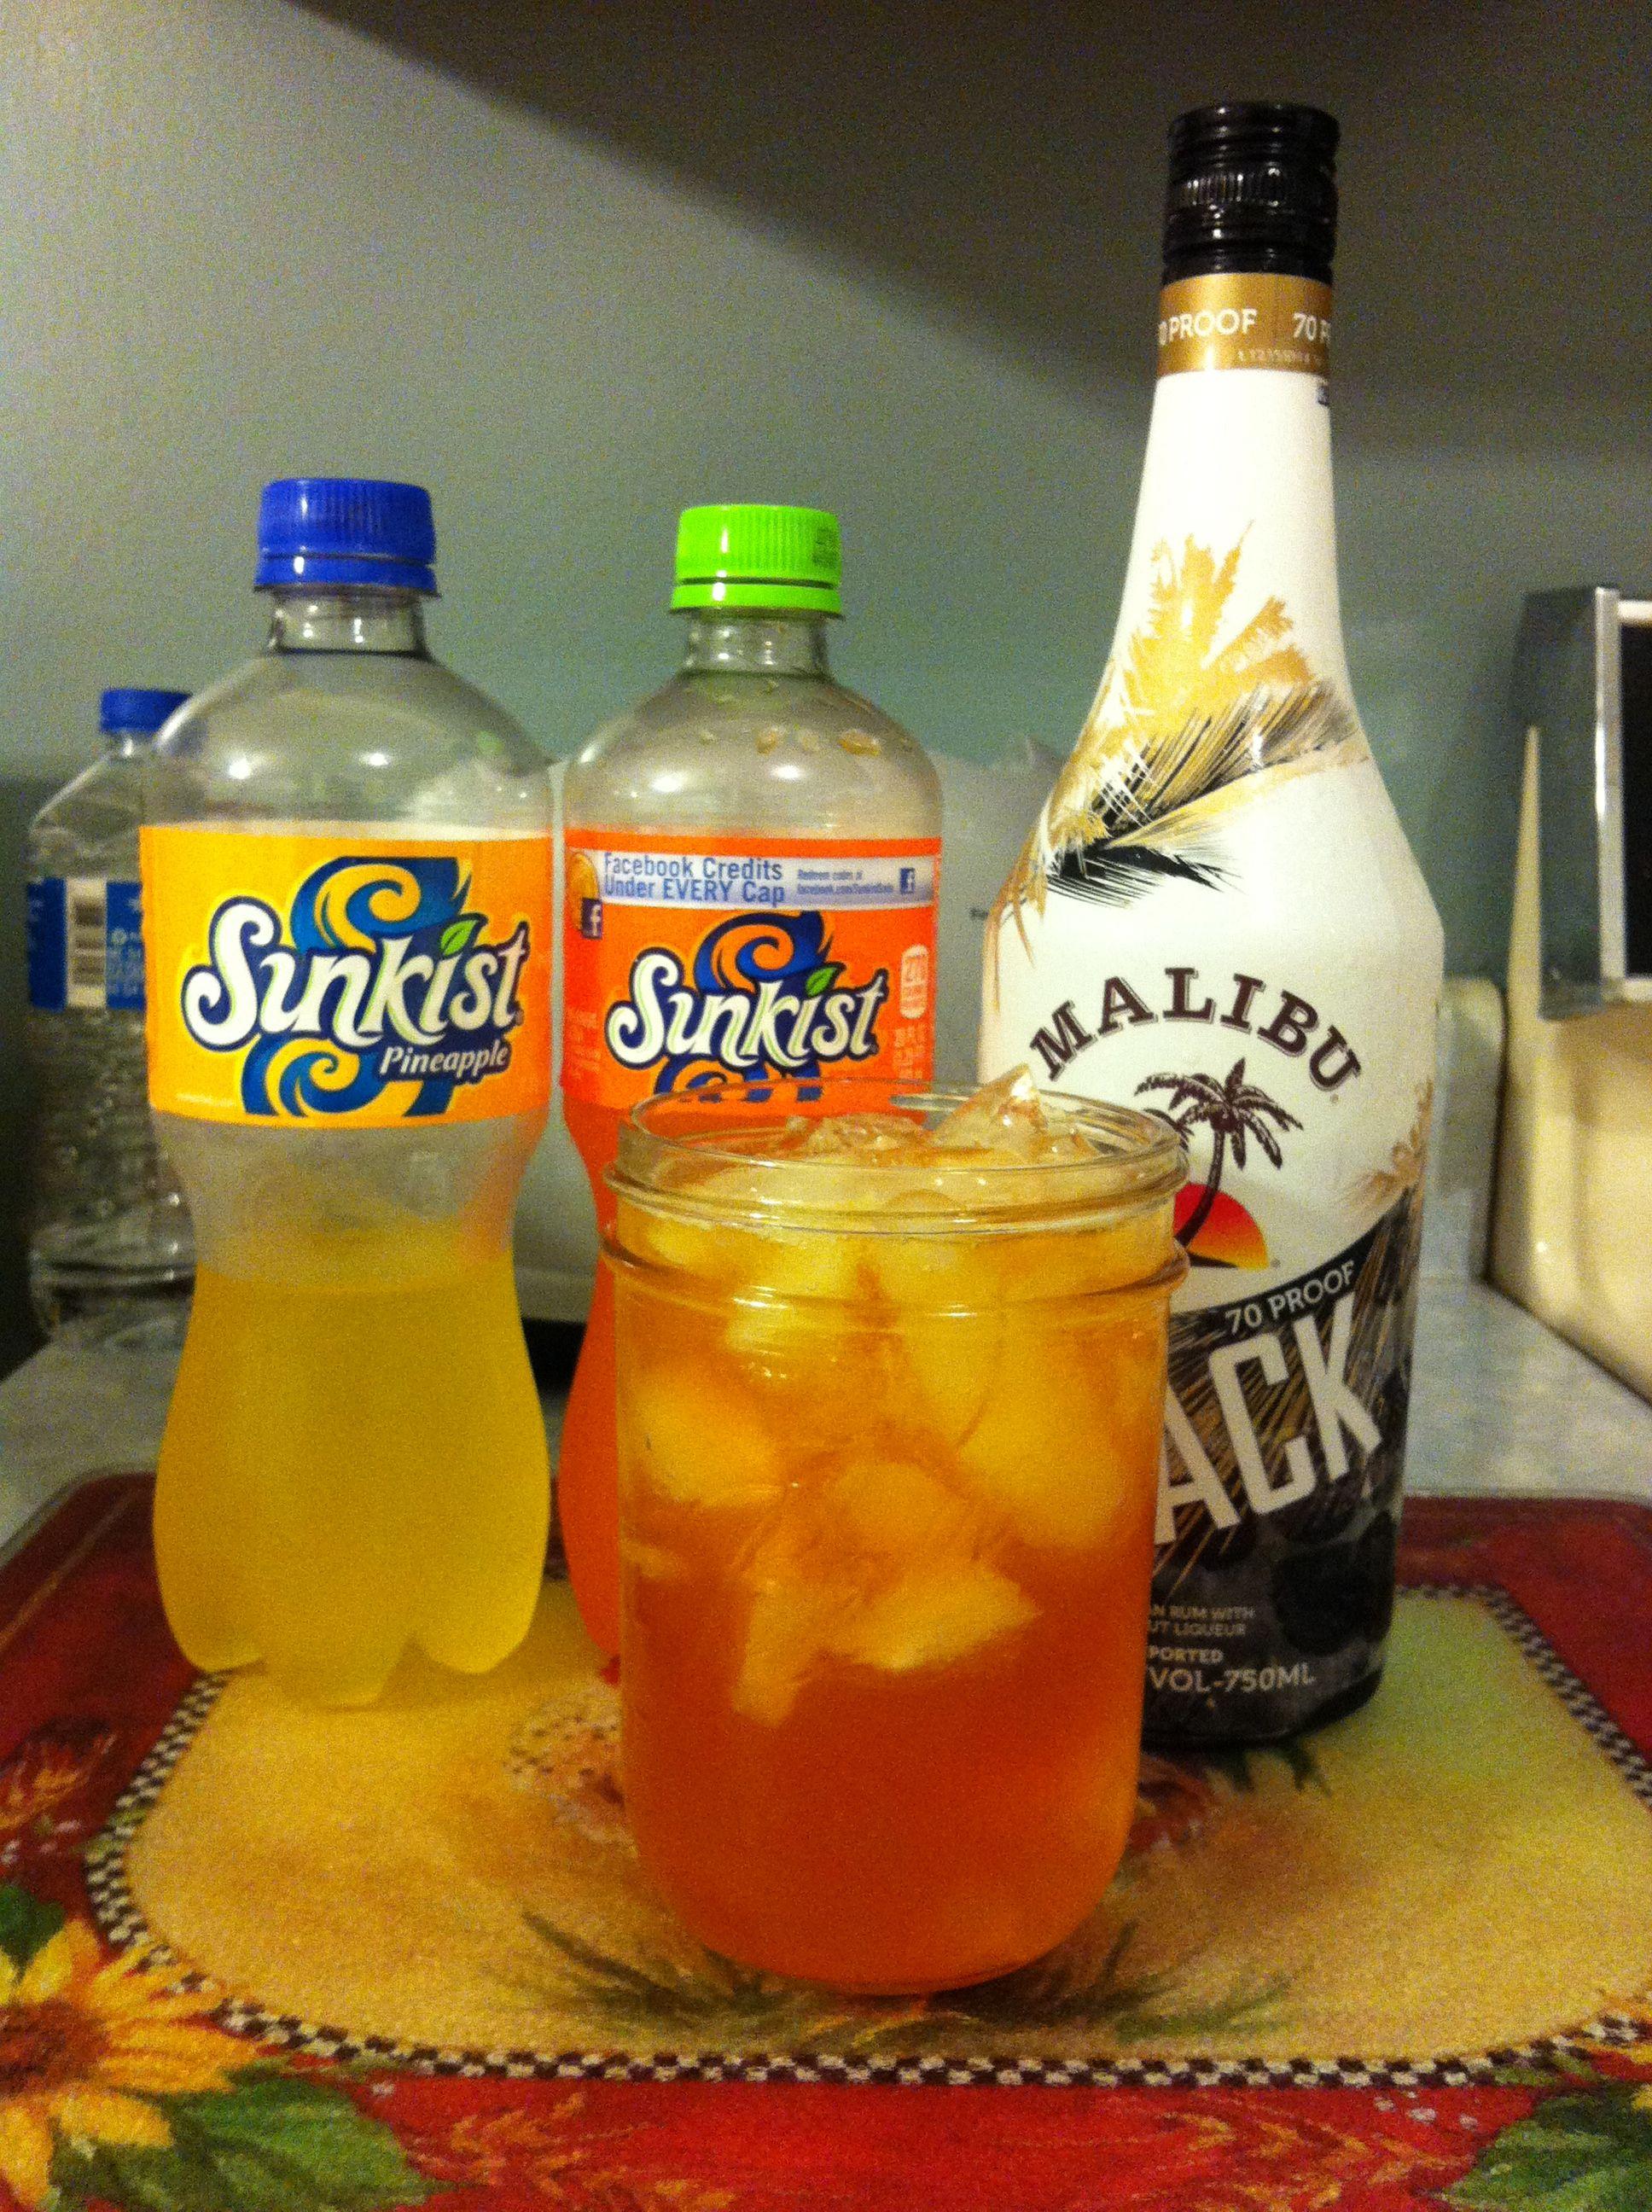 Bahama Fizzzzzz Sunkist Pineapple and Orange sodas mixed with Malibu